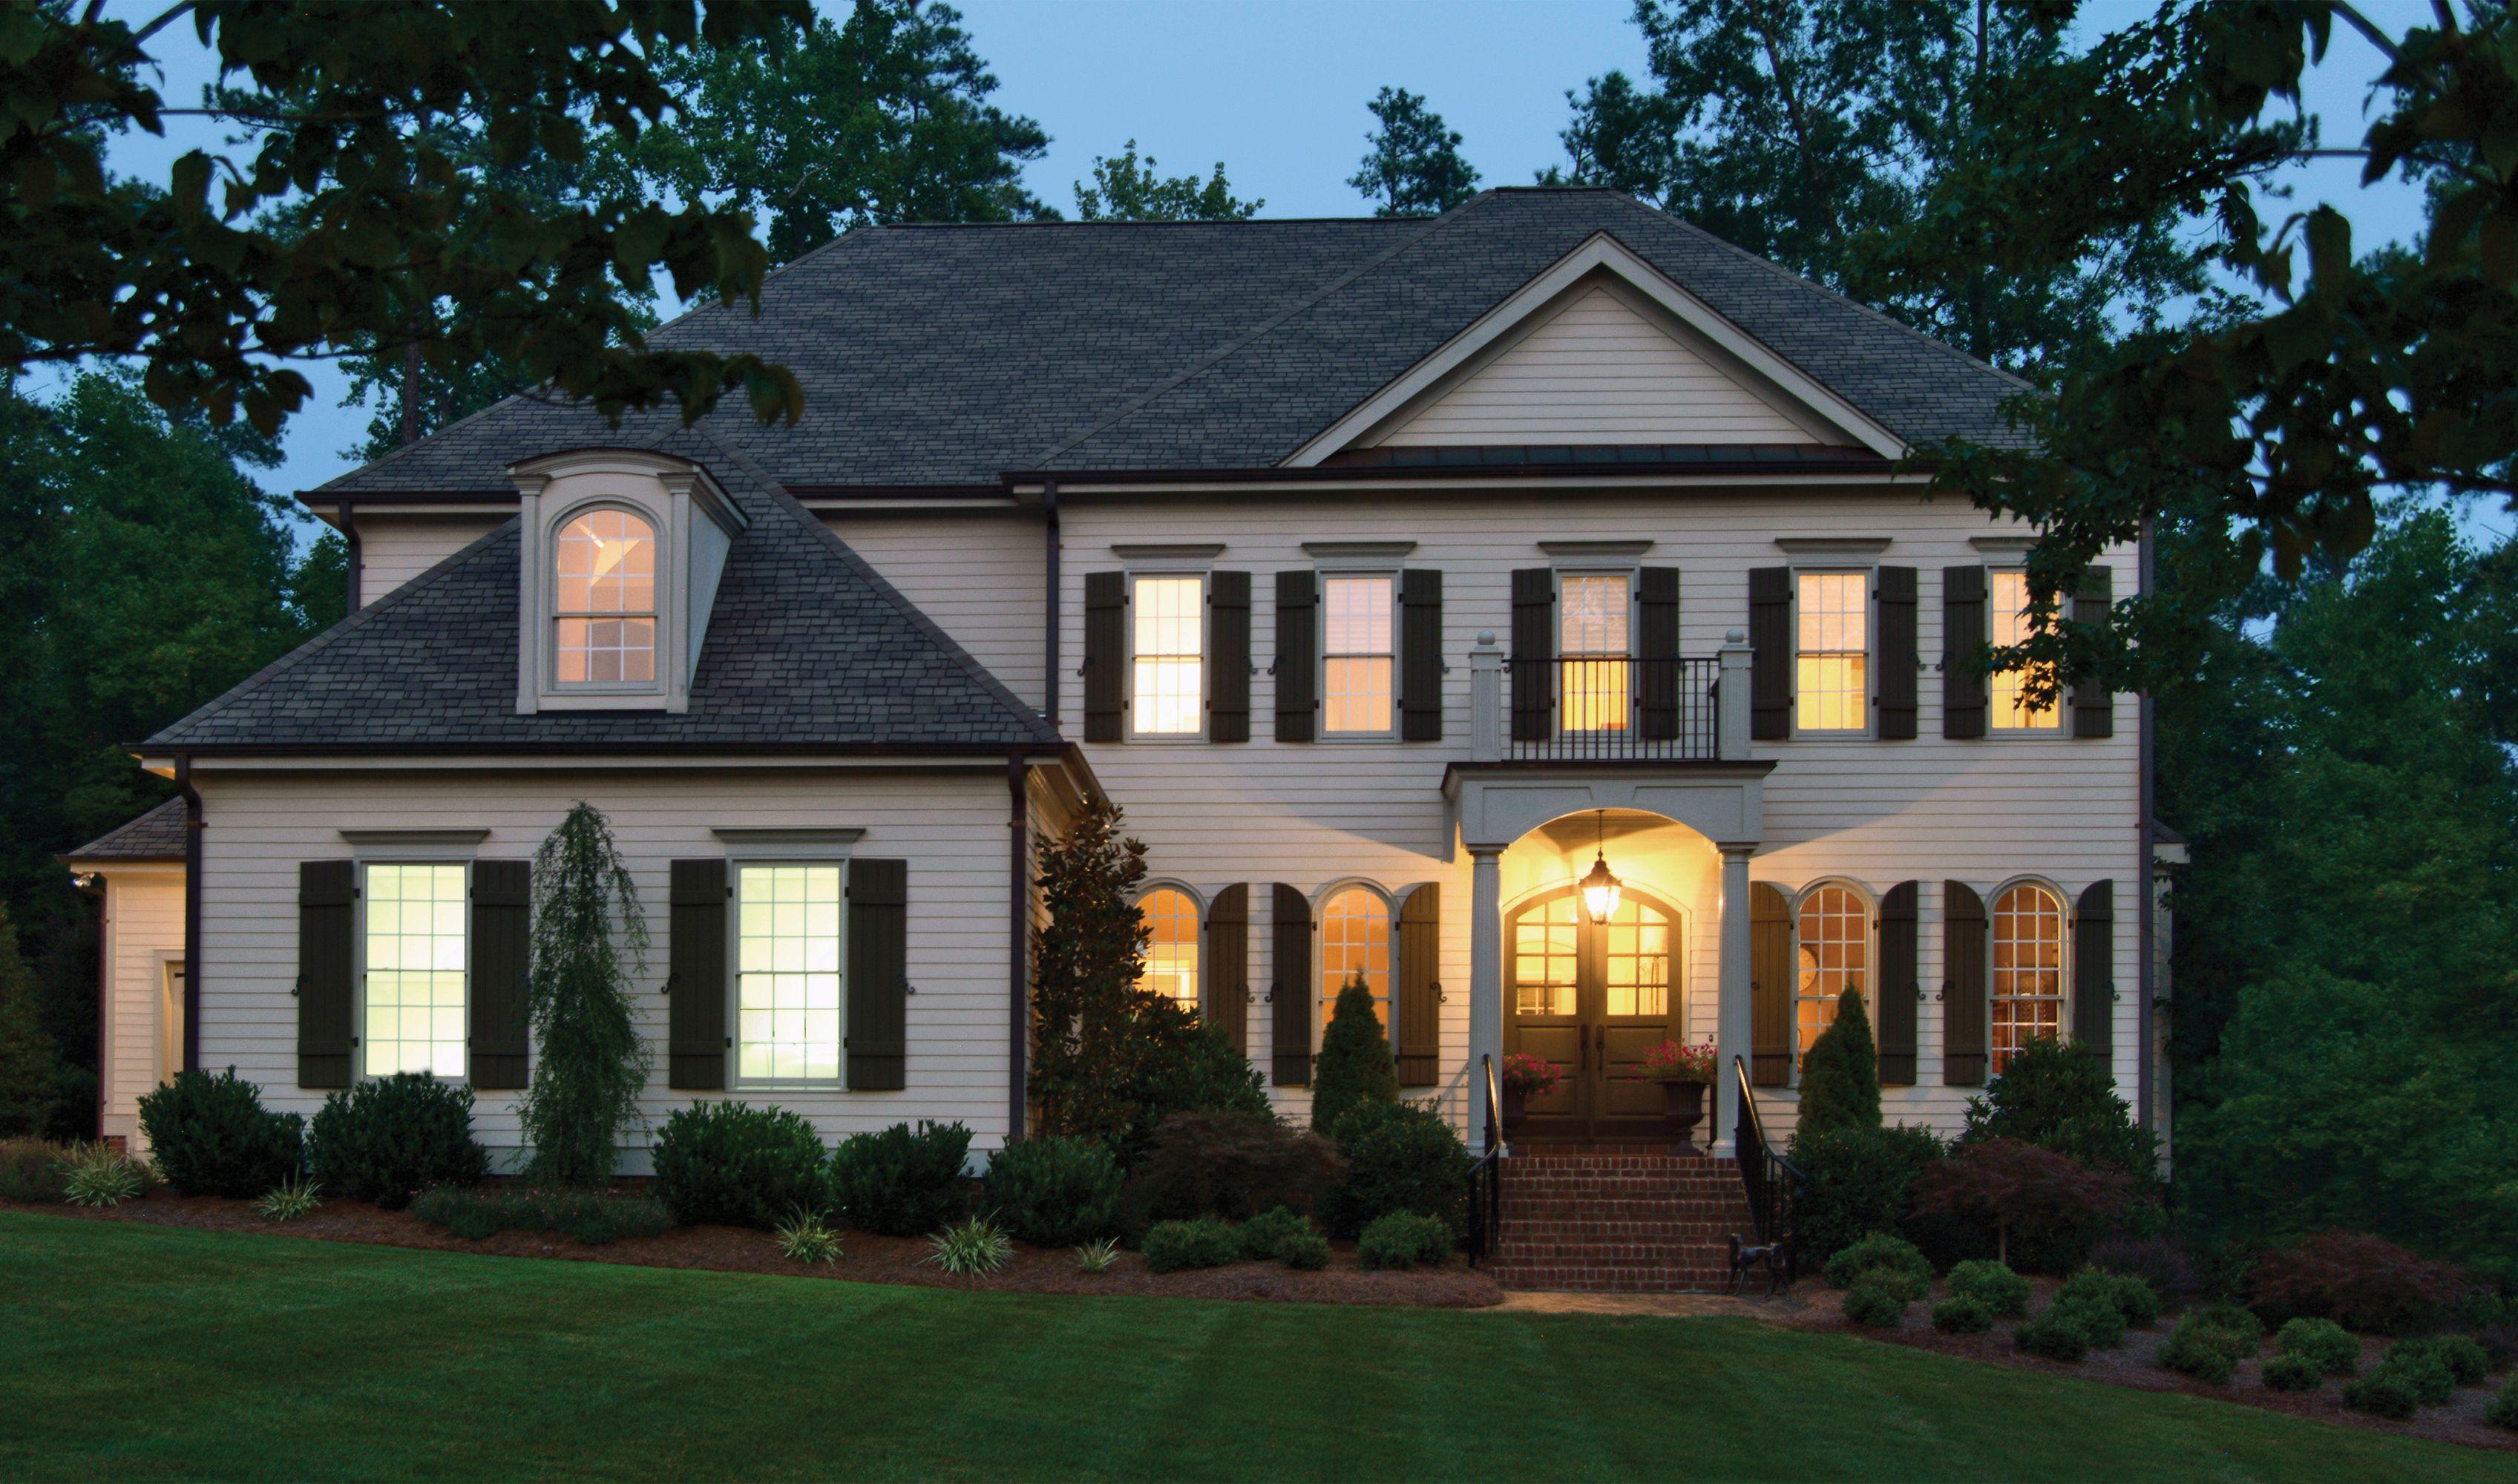 Blog Mydesign Home Studio House Exterior Estate Homes Real Estate